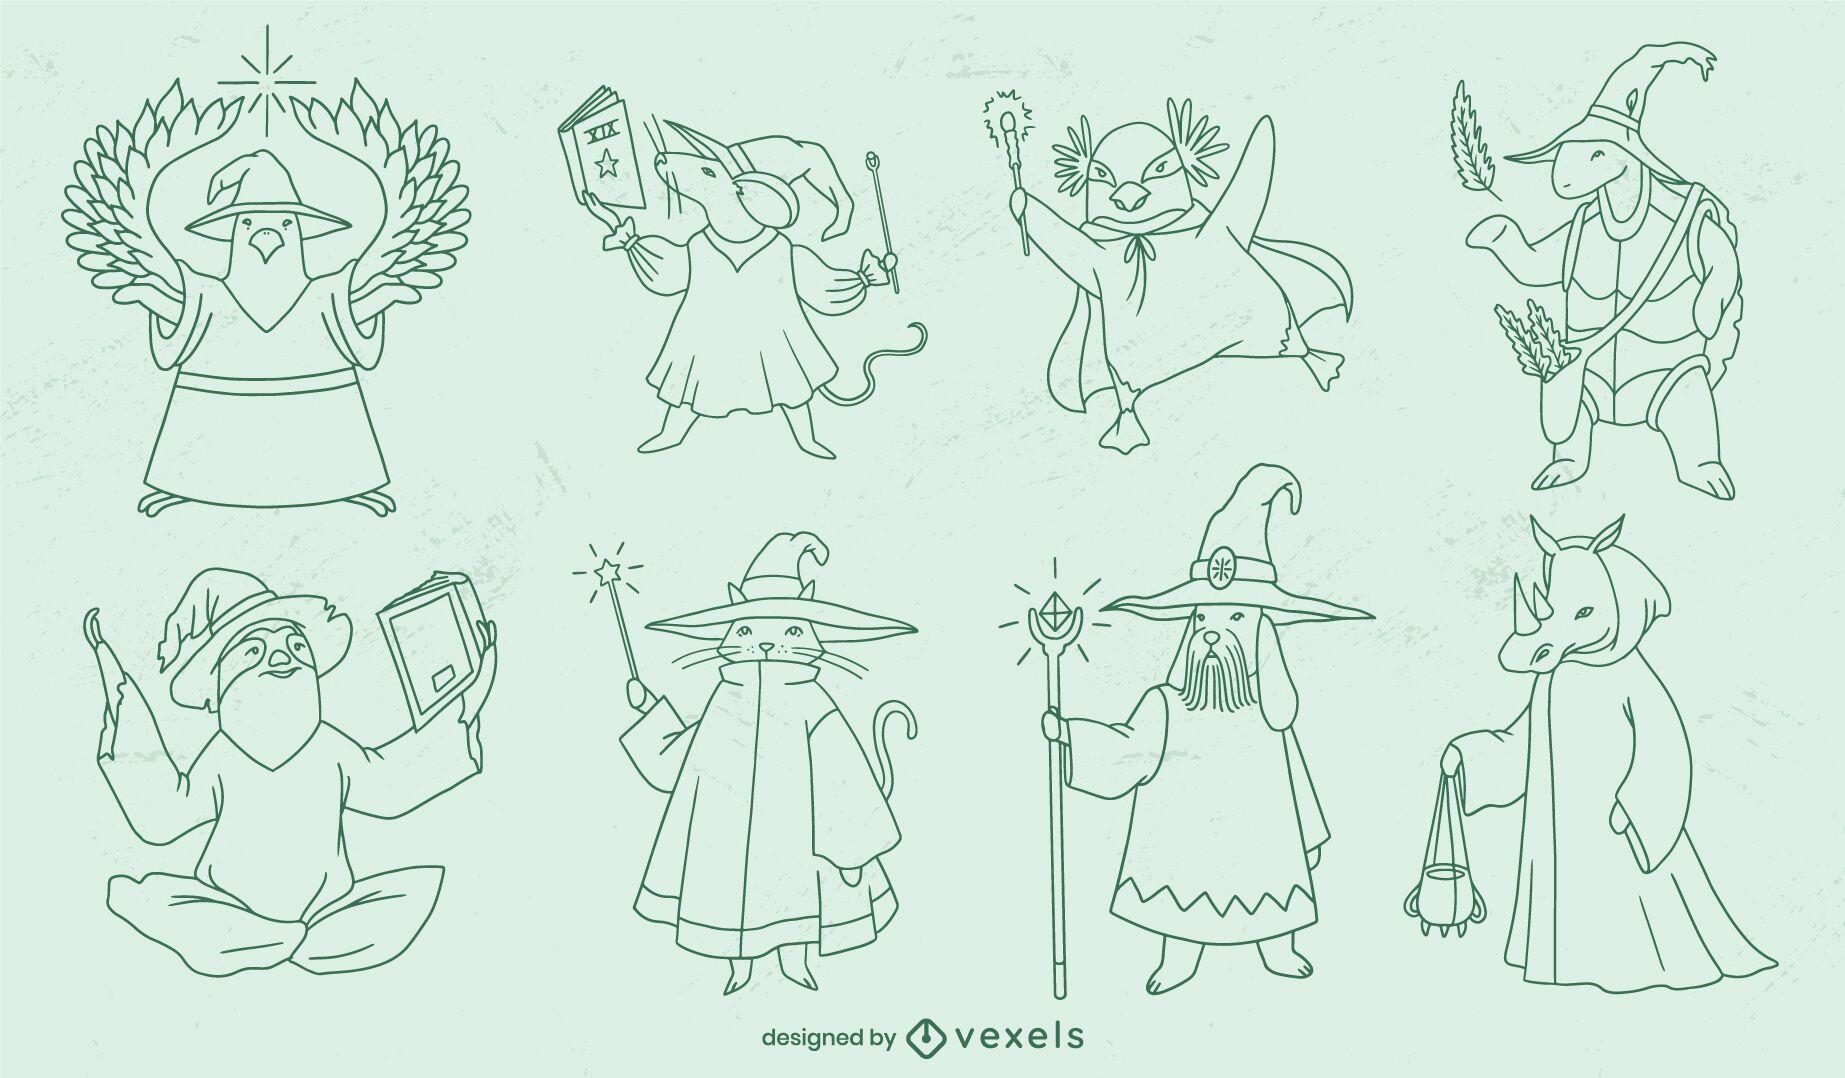 Animal sorcerers fantasy characters stroke set